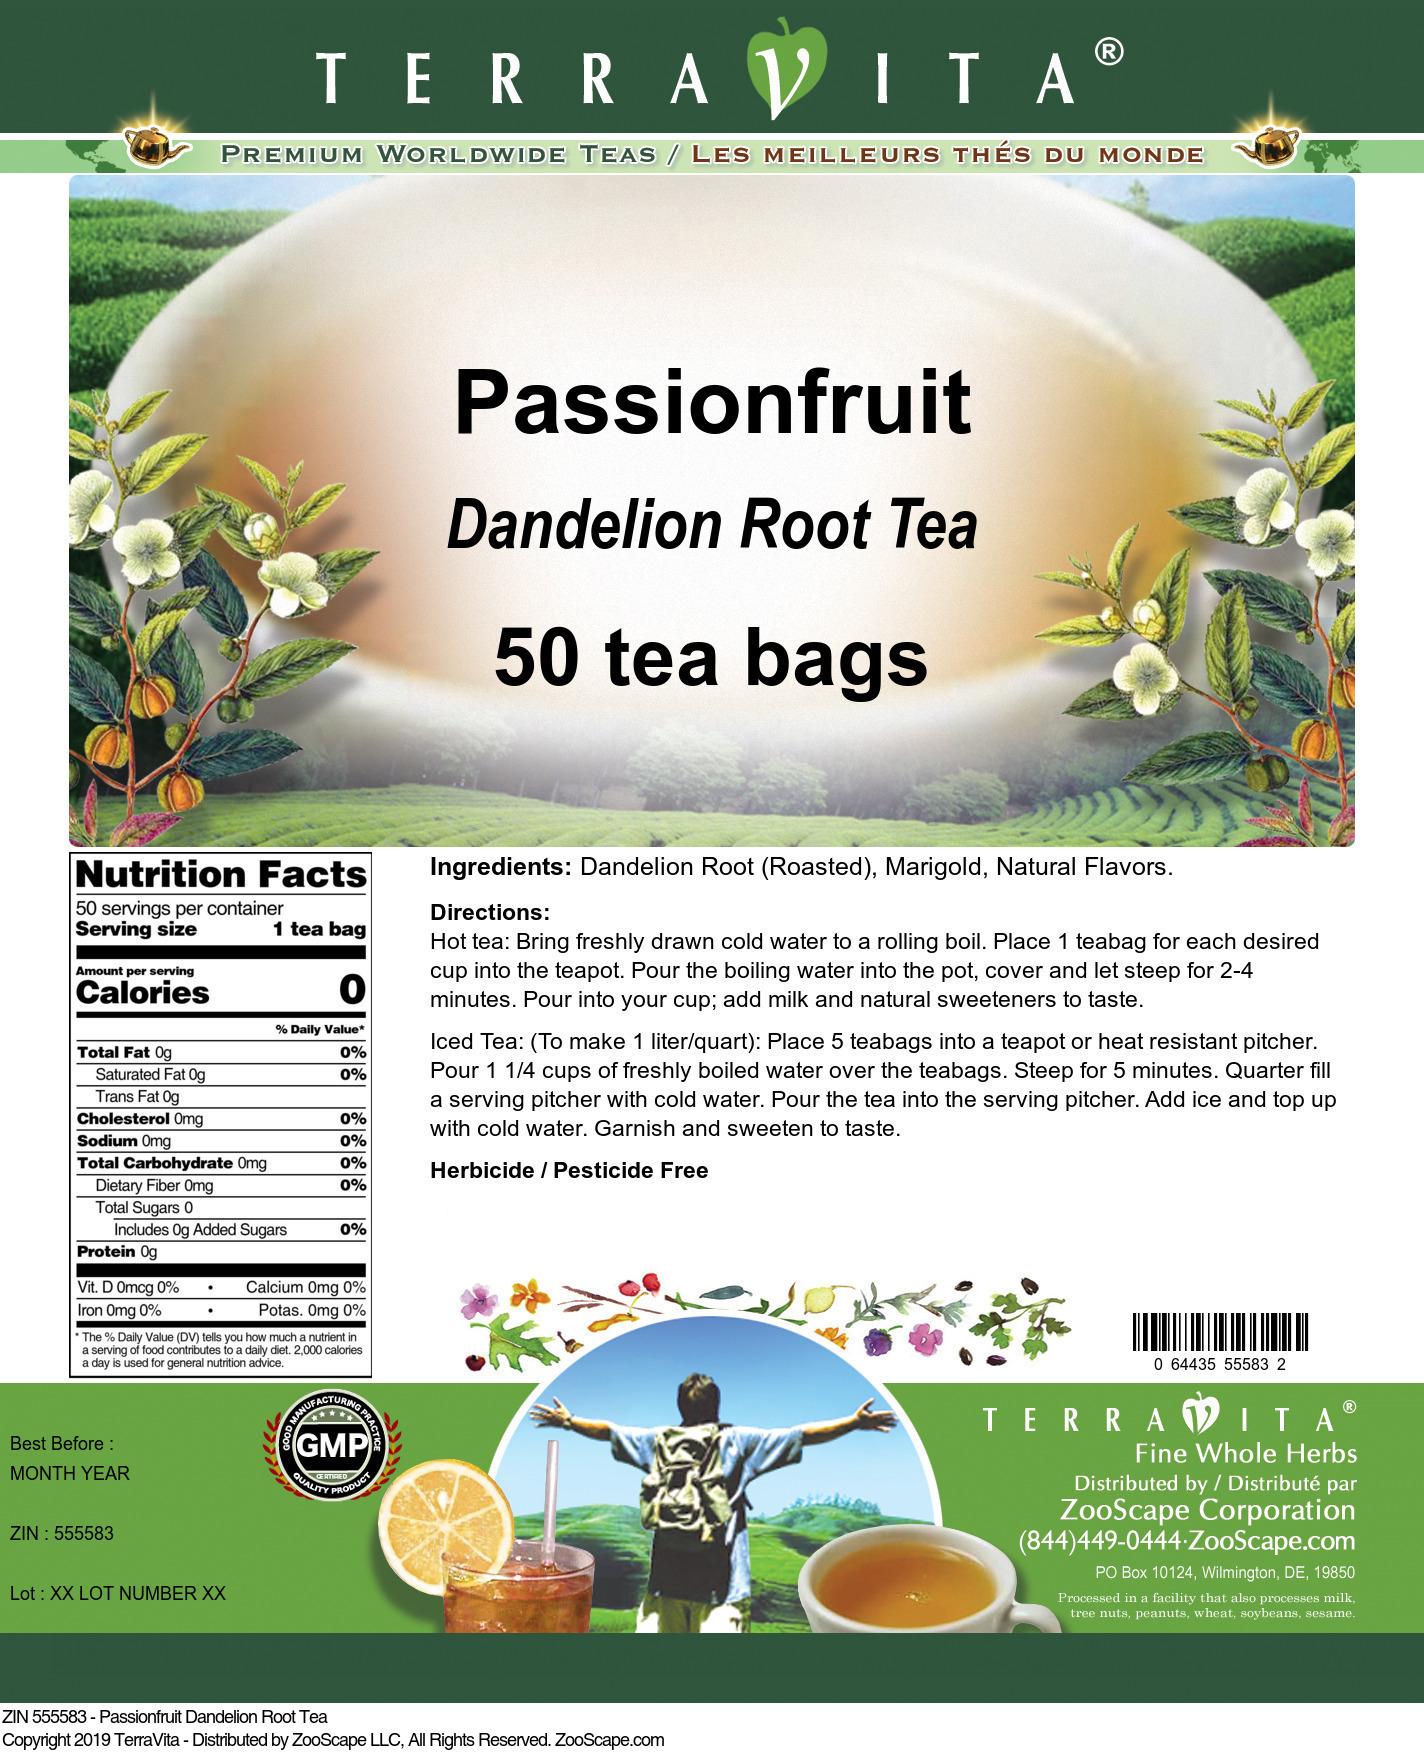 Passionfruit Dandelion Root